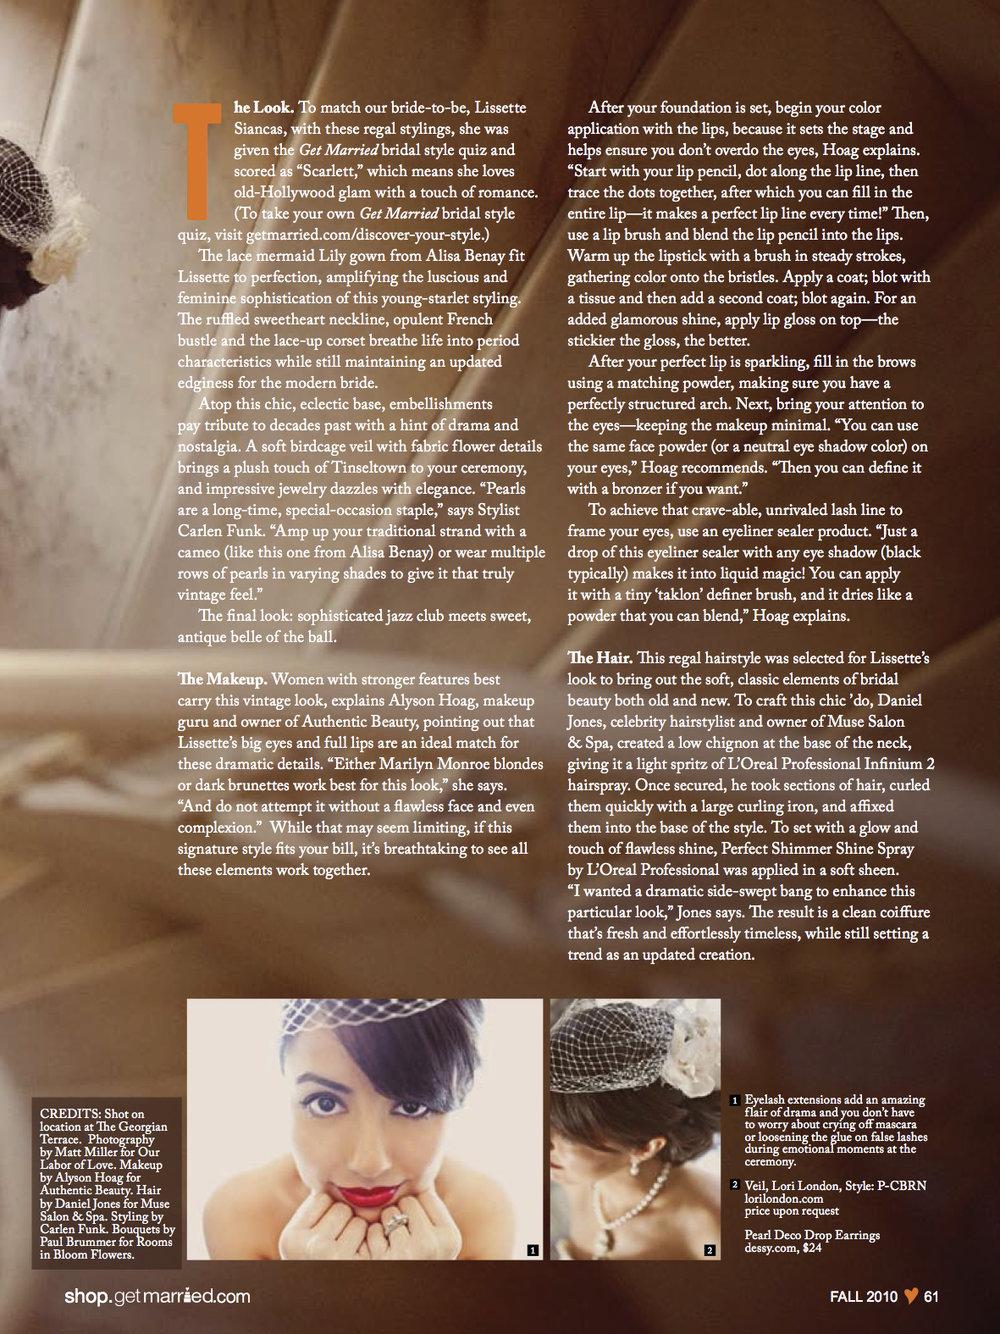 FALL2010_page61.jpg